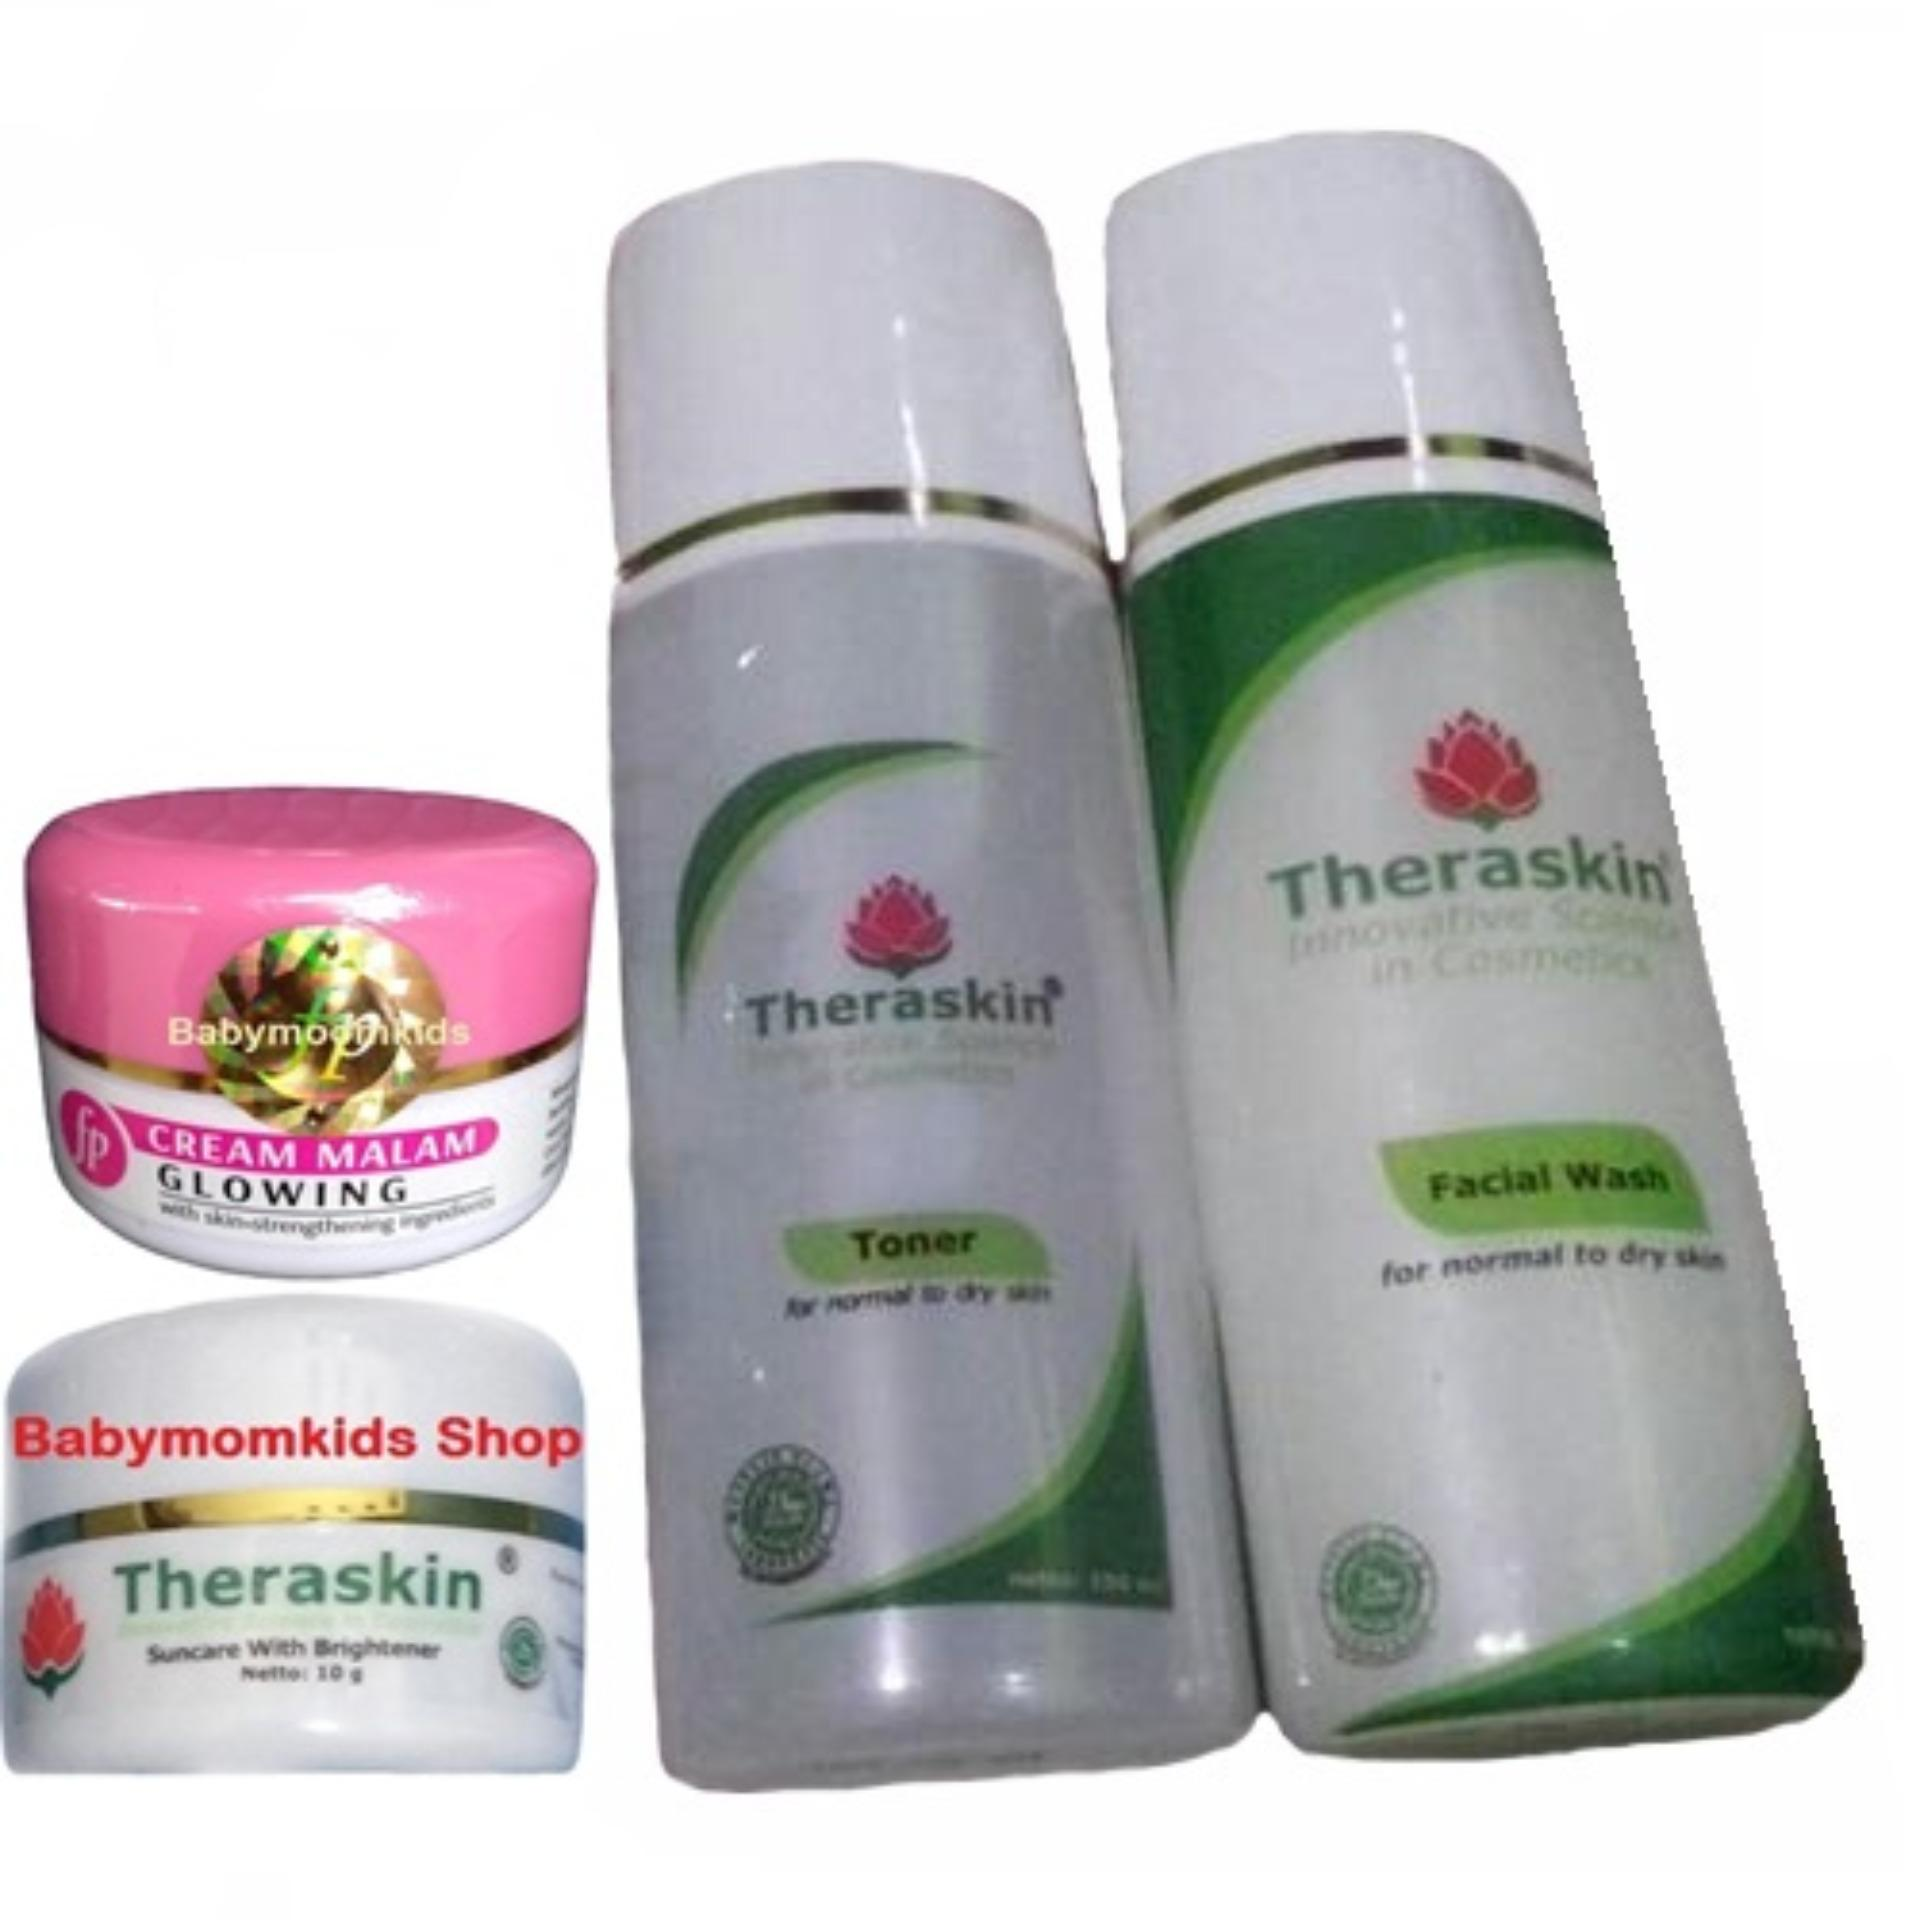 Pencari Harga Theraskin Paket Glowing Kulit Normal 1 Set 4pcs Cream Bpom Malam Siang Facial Wash